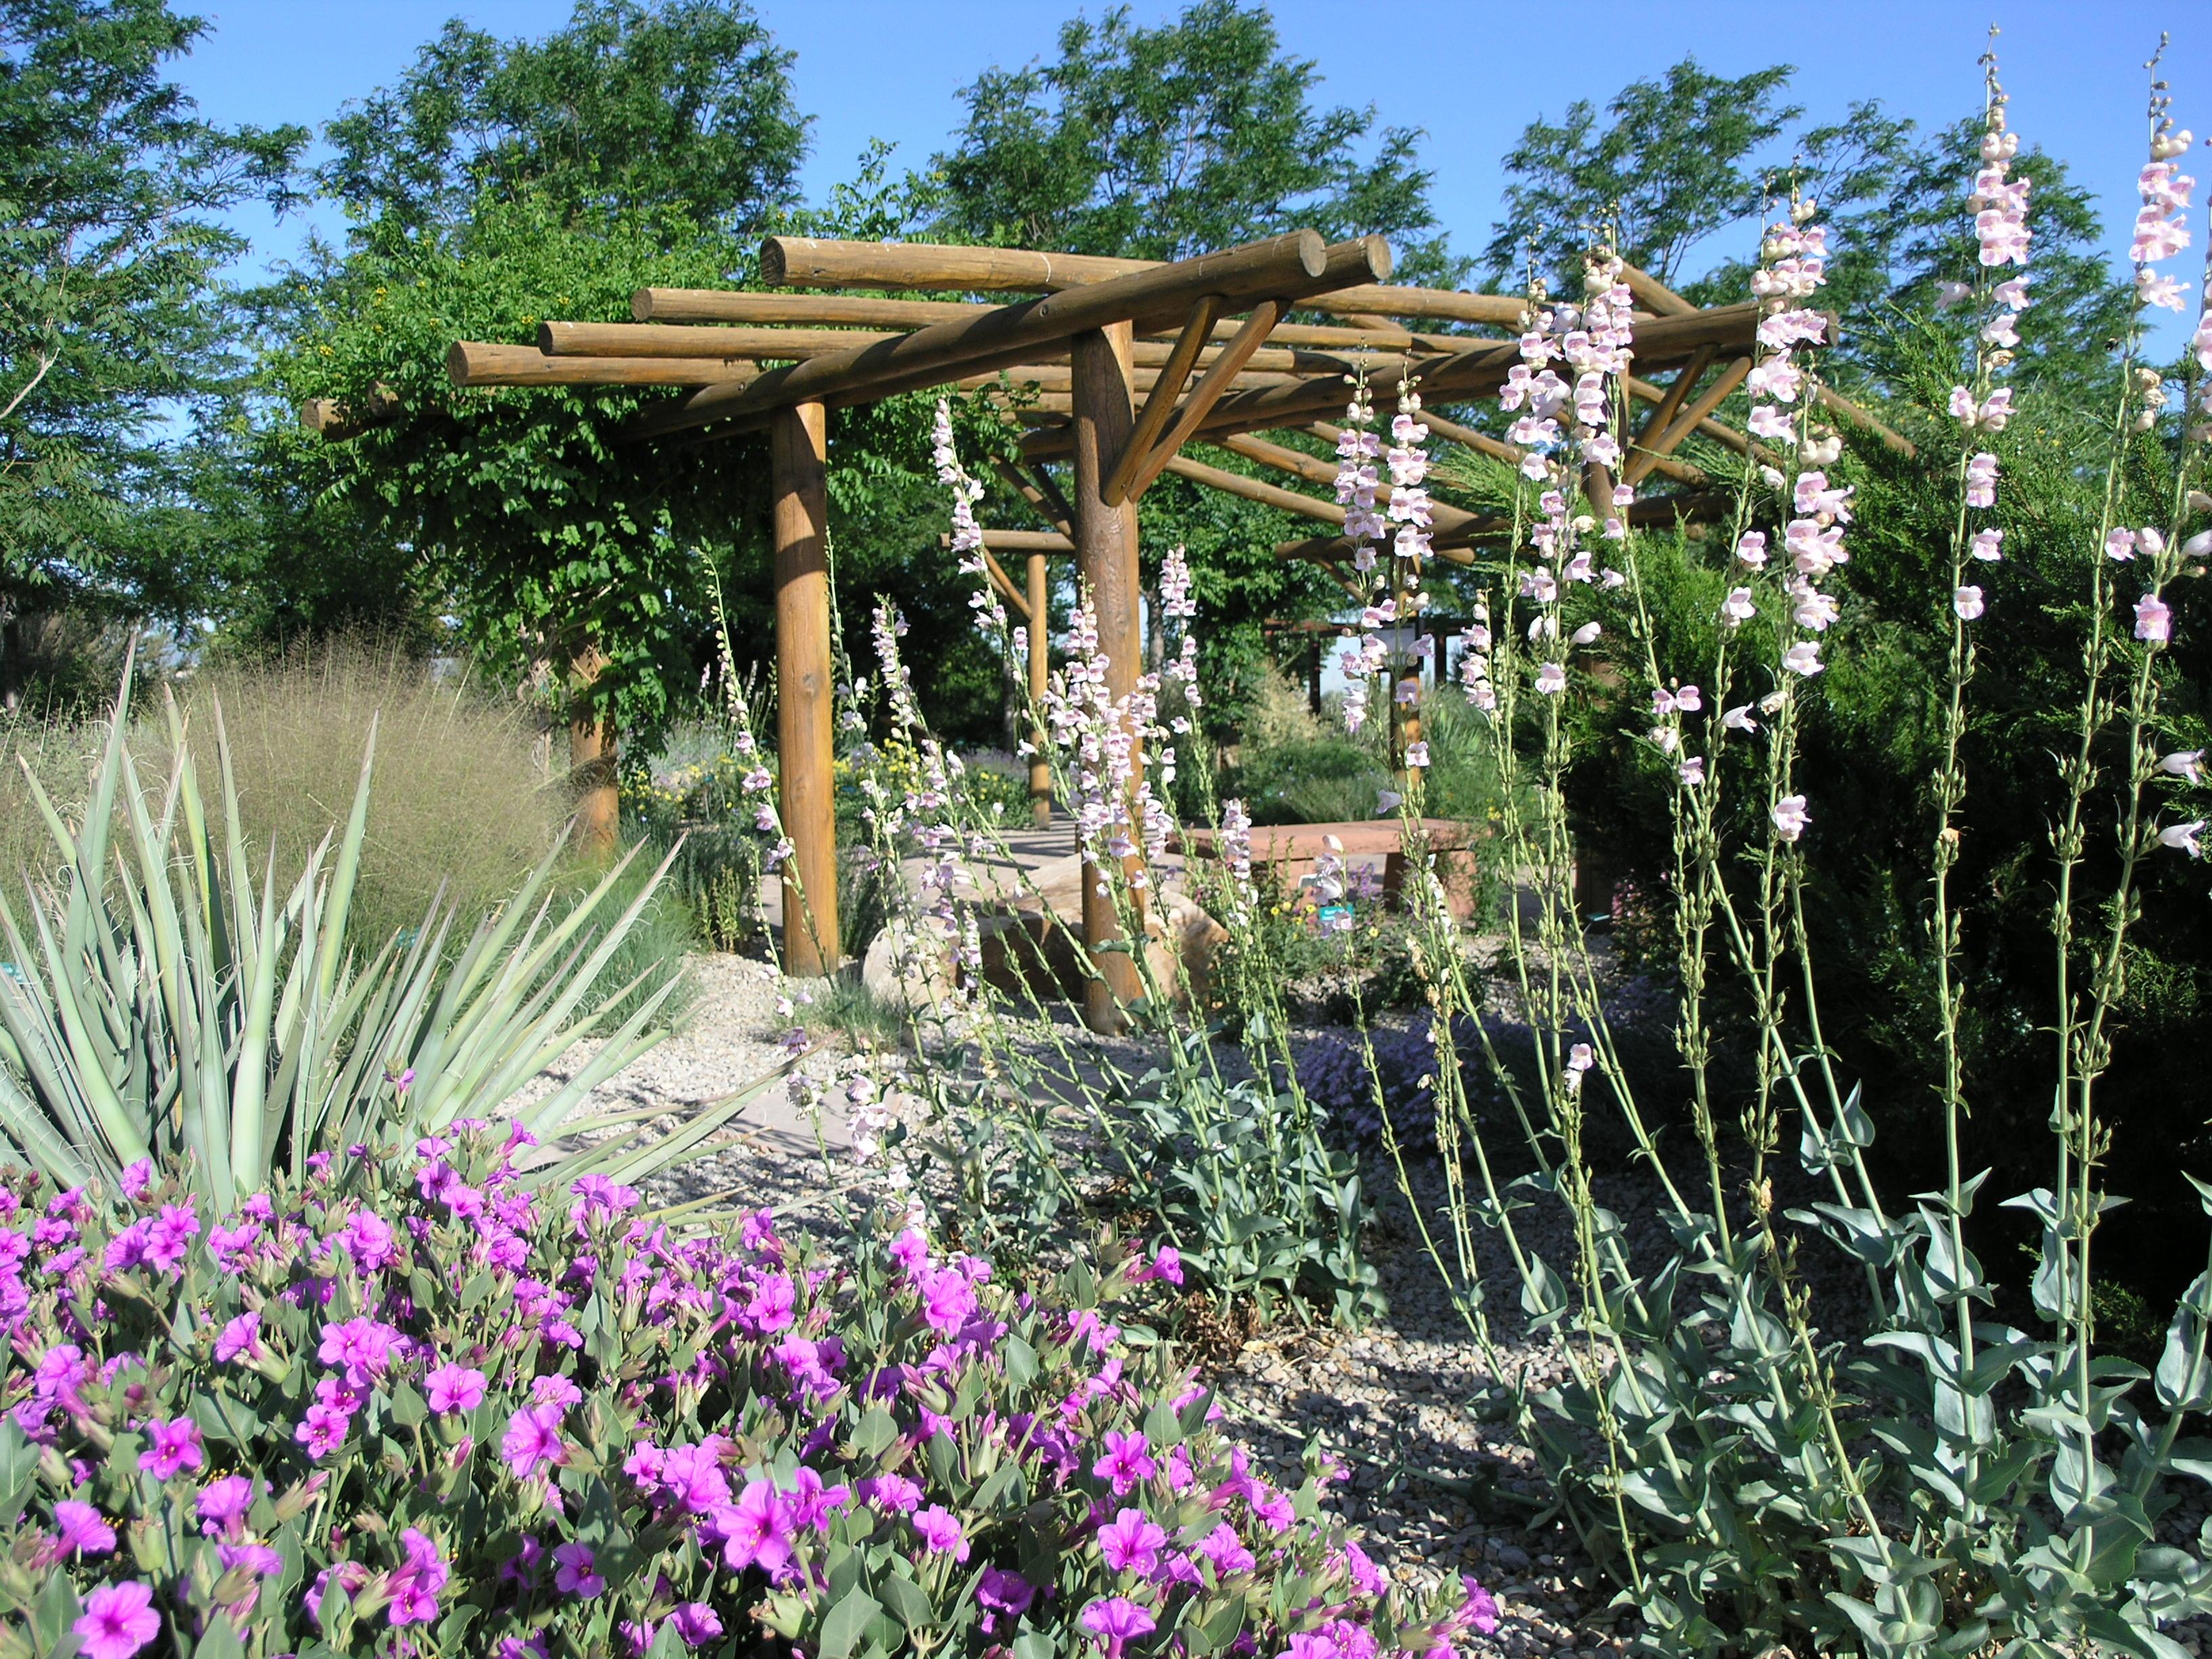 Garden Bush: Conservation Garden Park (West Jordan)